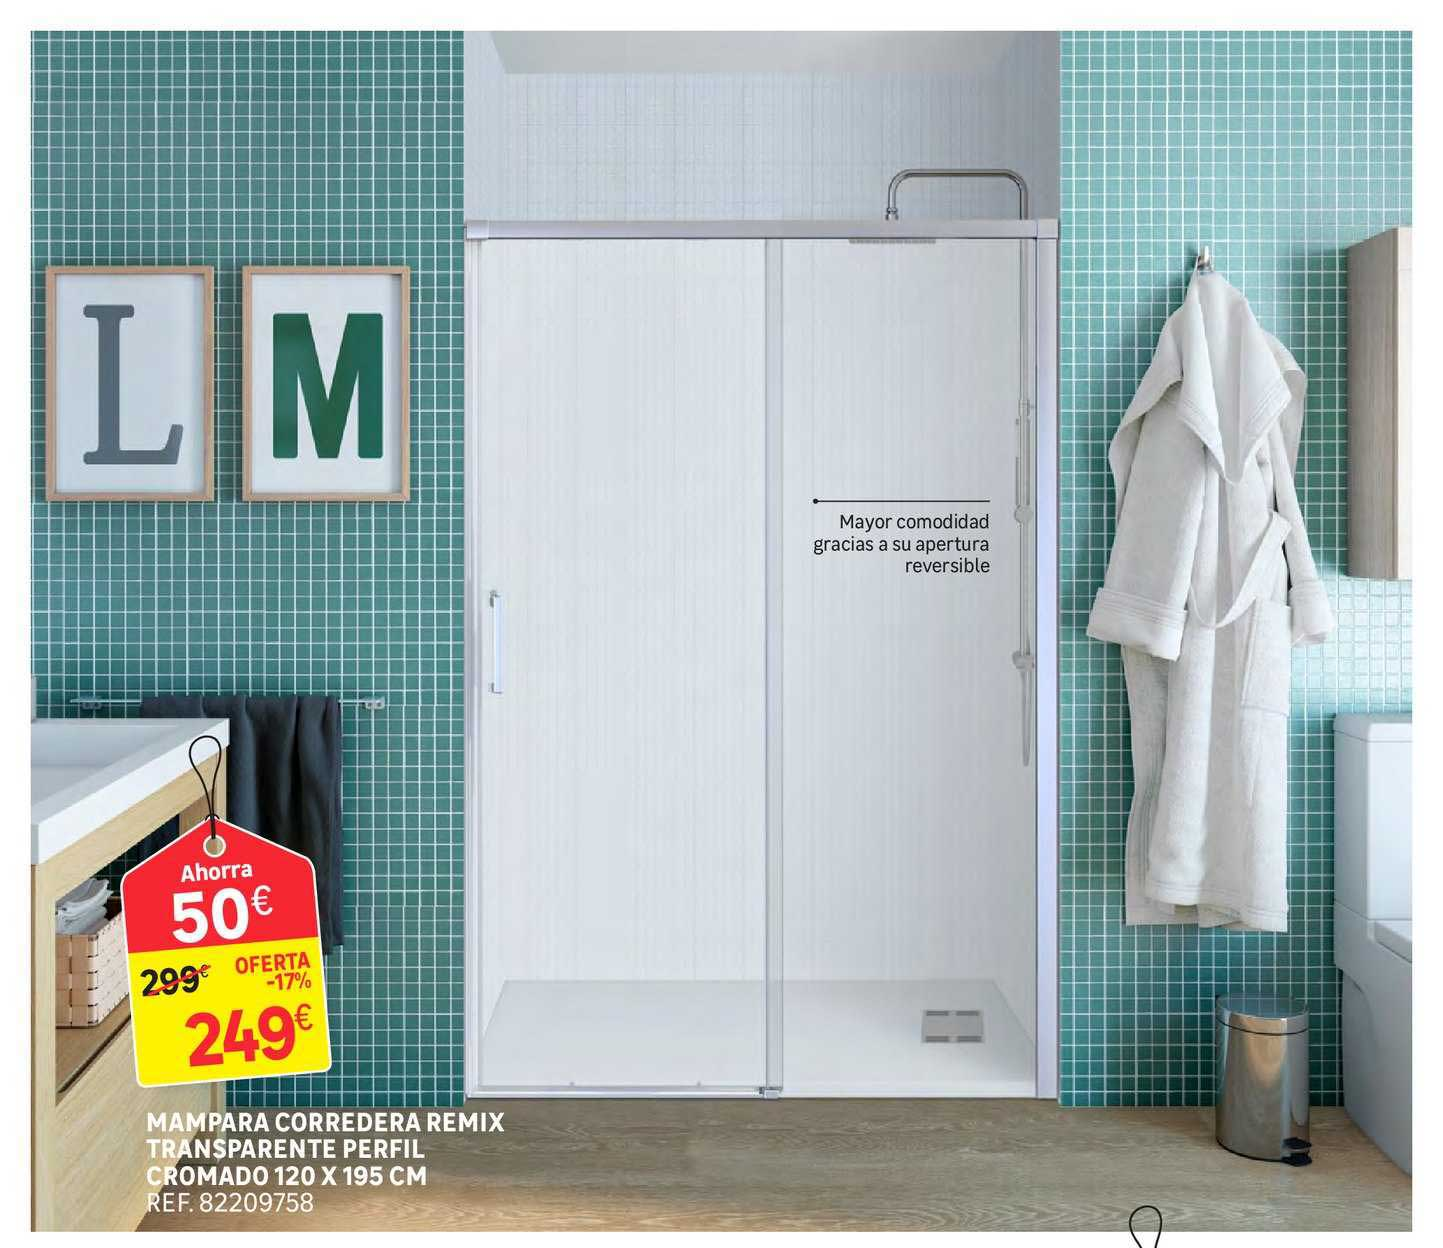 Oferta Mampara Corredera Remix Transparente Perfil Cromado 120x195 Cm En Leroy Merlin